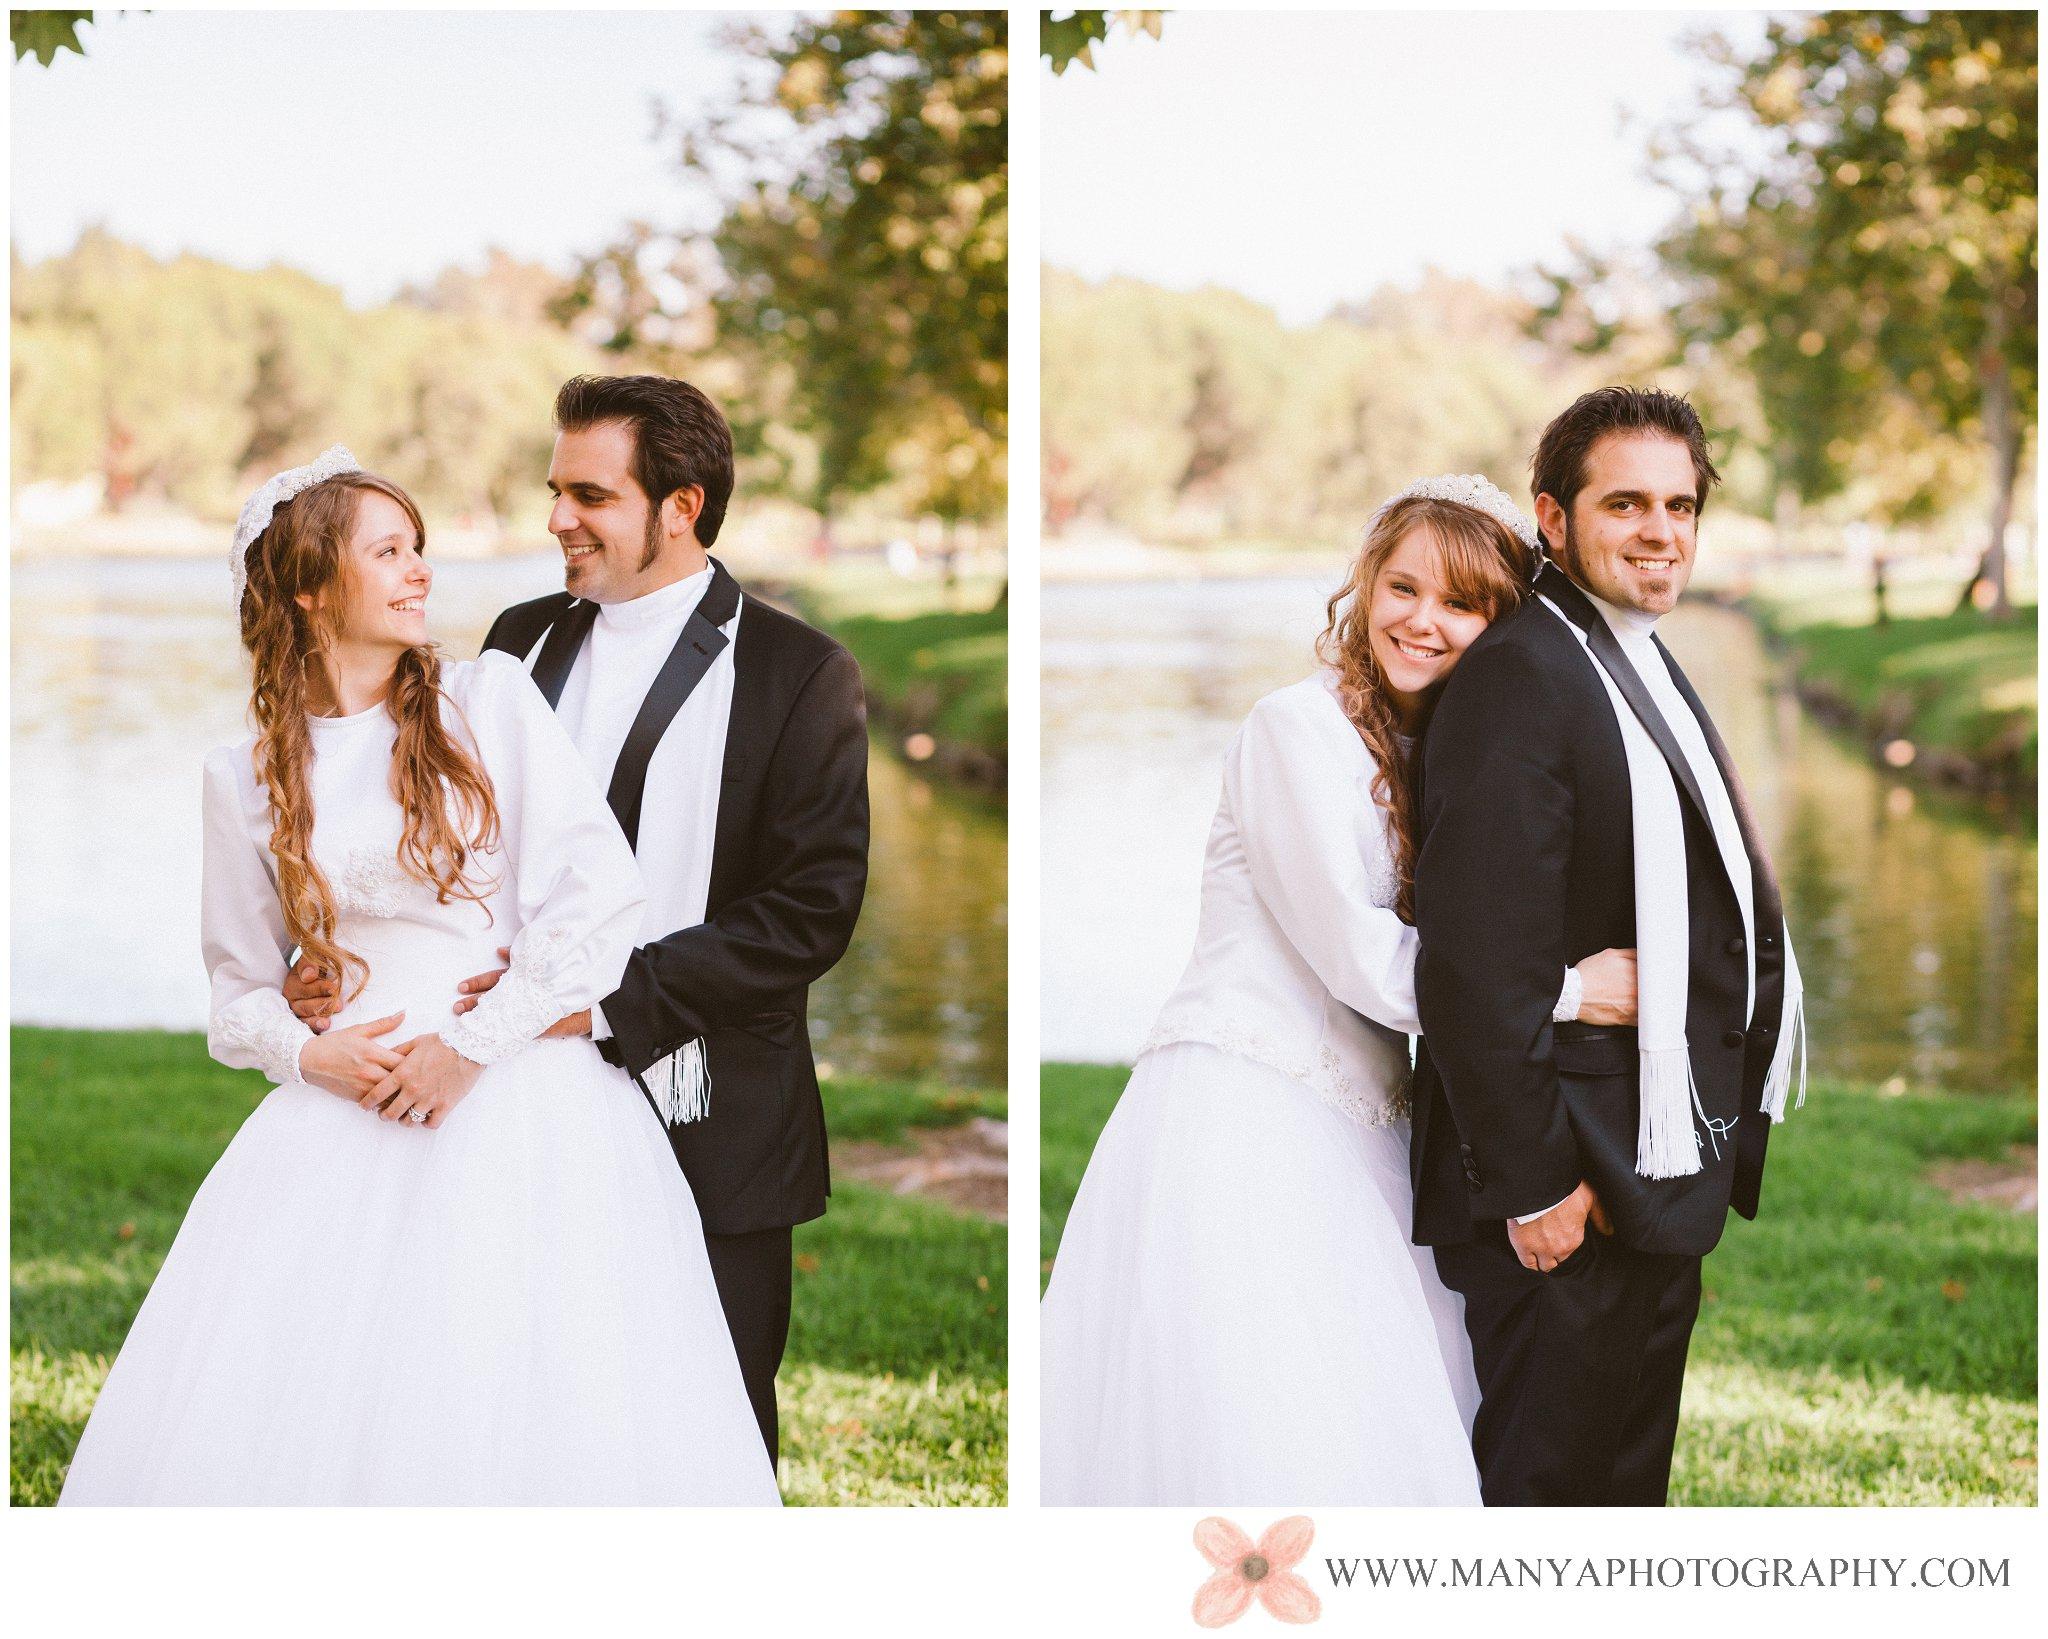 2013-10-16_0006 - Orange County Wedding Photographer